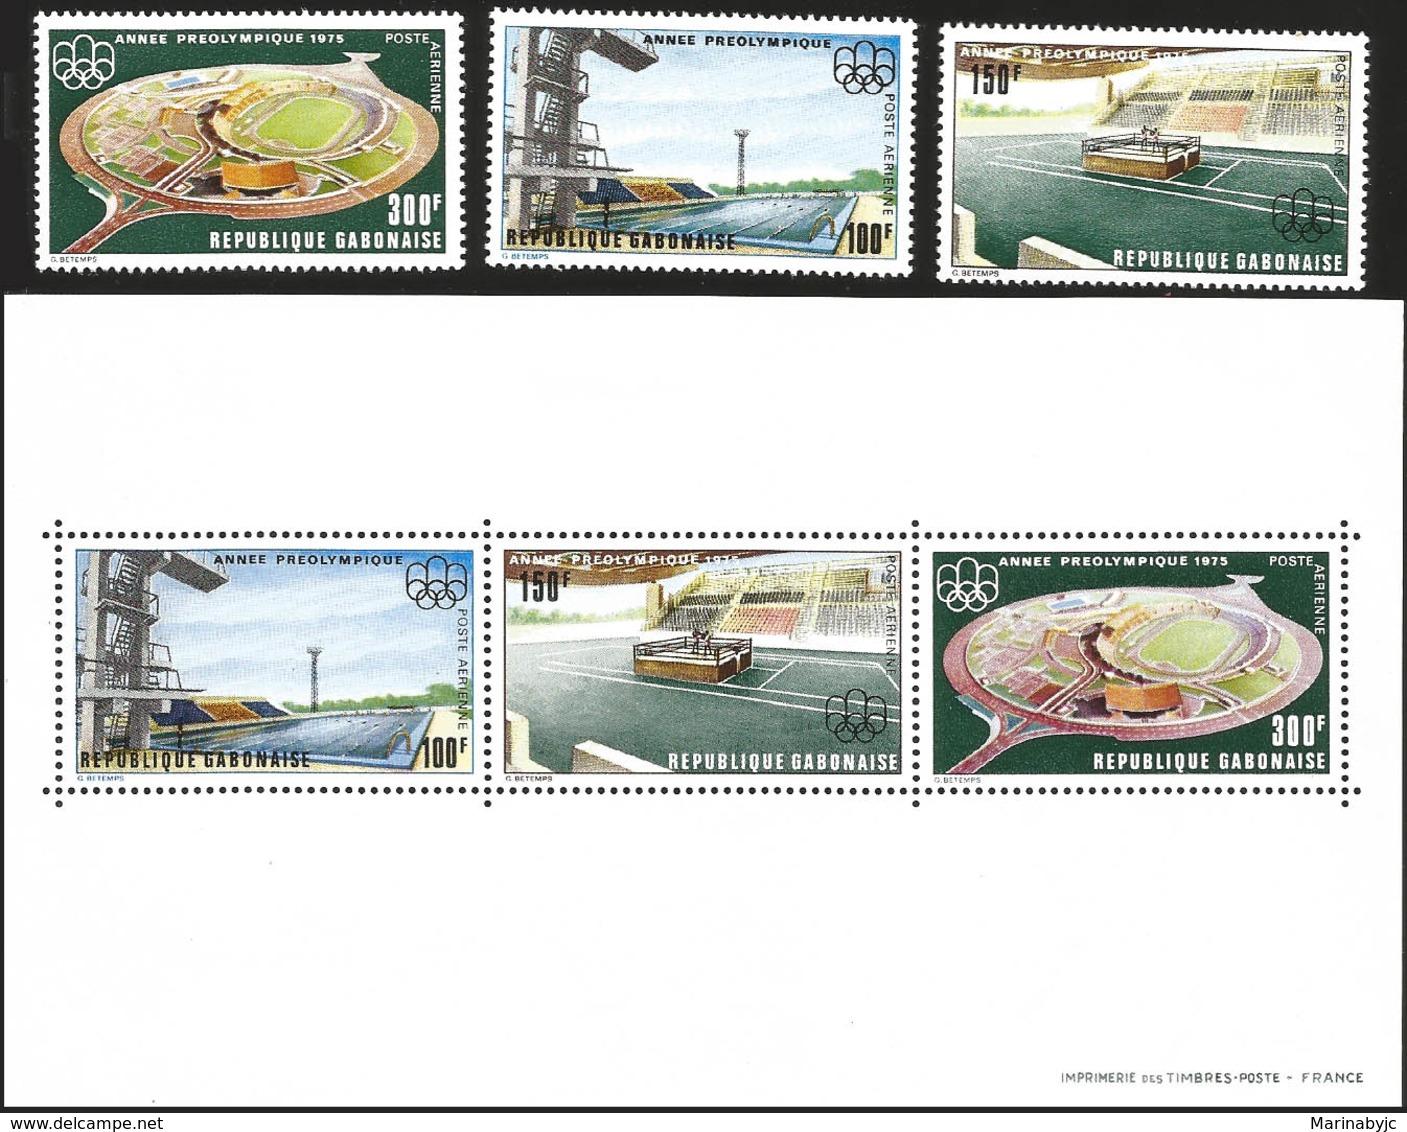 V) 1975 GABON, PRE OLYMPIC YEAR, MNH - Gabon